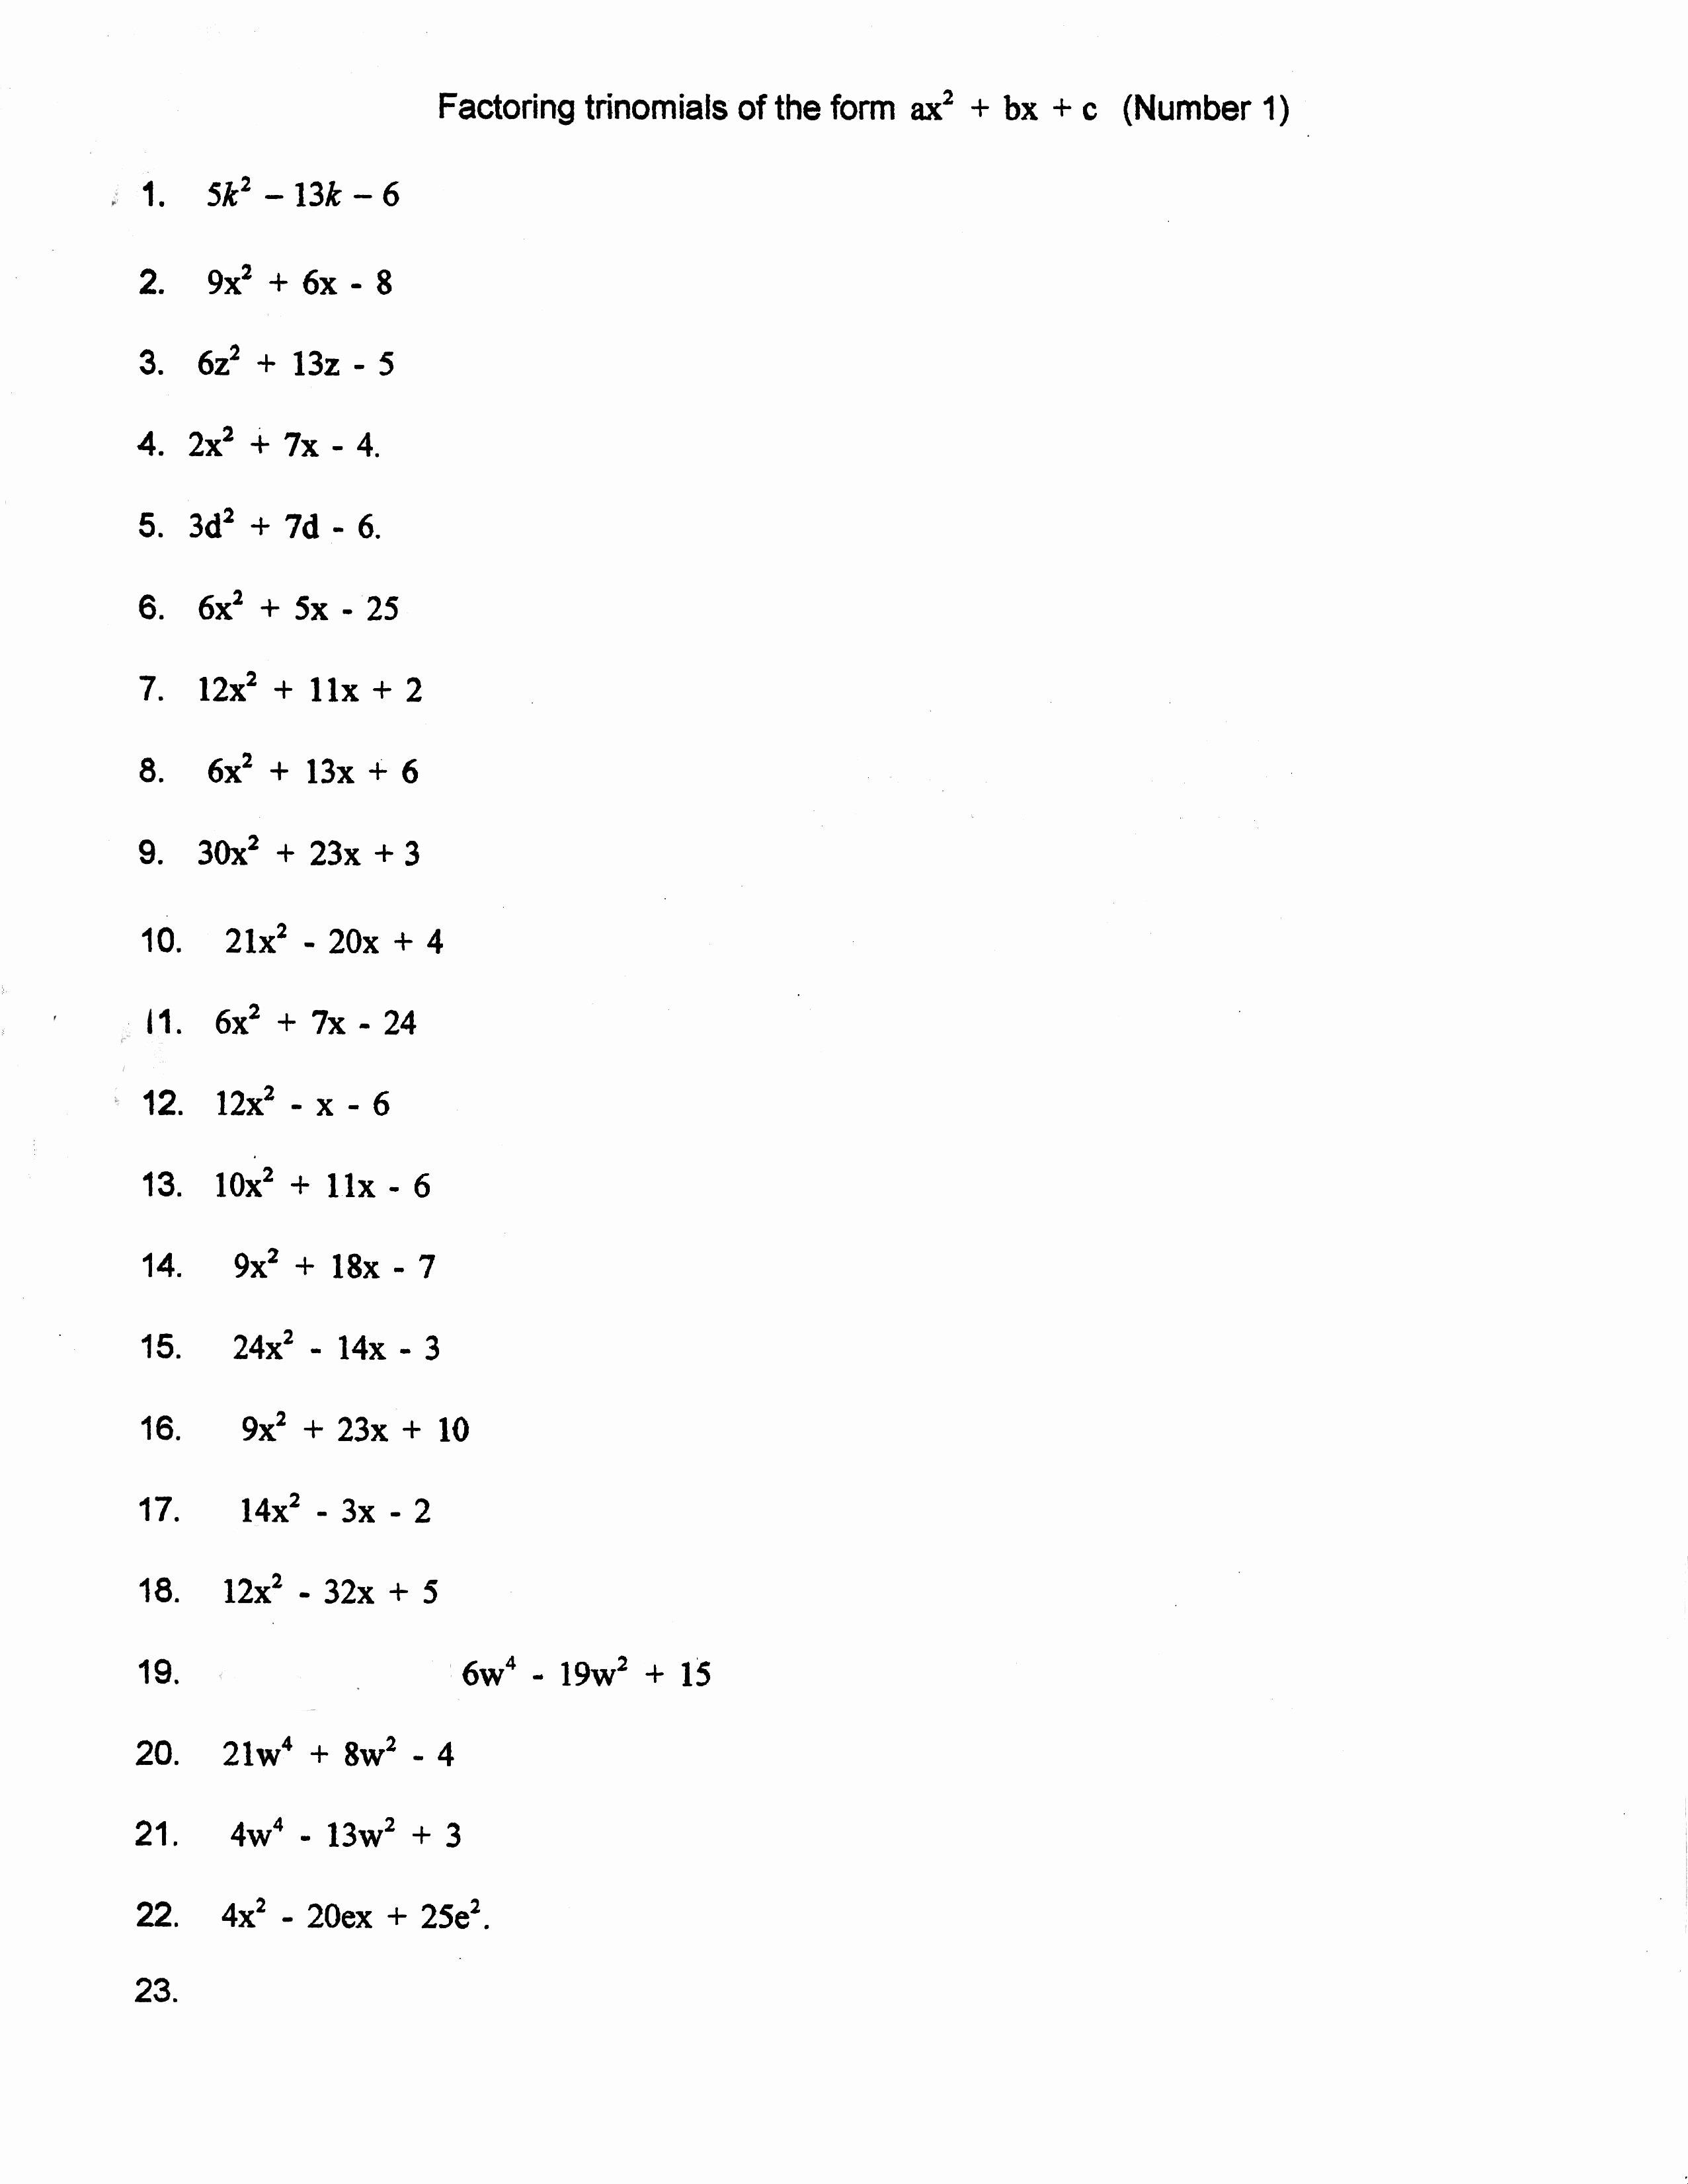 Factoring Trinomials Practice Worksheet Unique Factoring Trinomials Trial and Error Worksheet